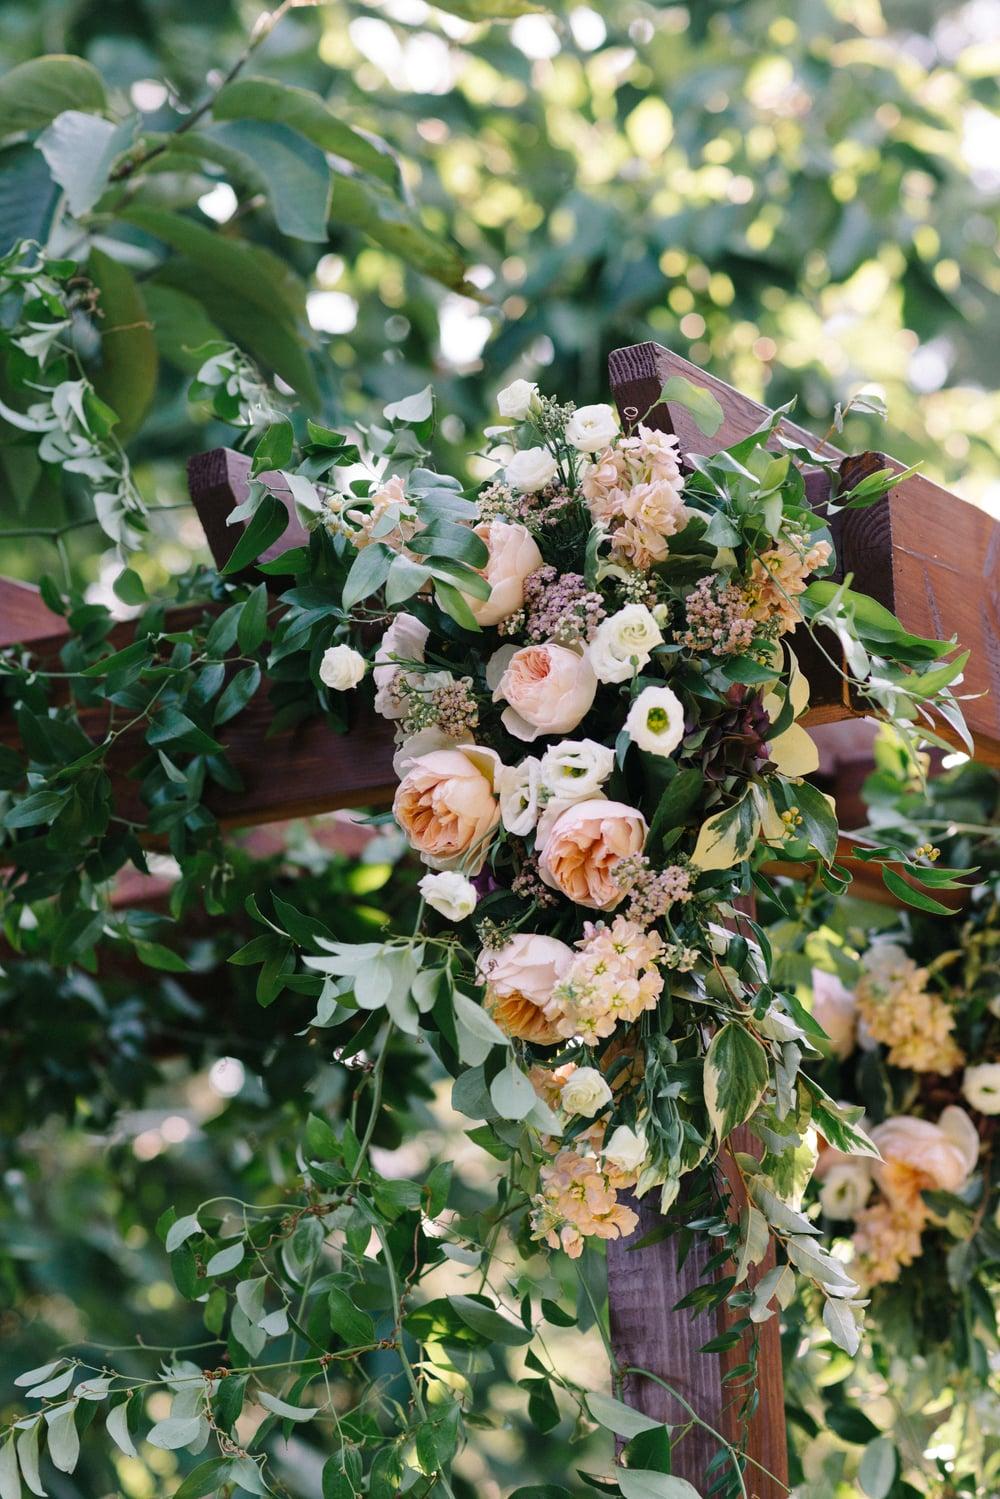 A Garden Party Florist, Inn at Fernbrook Farms, Michelle Lange Photography, Blush, Ceremony Flowers, Arbor